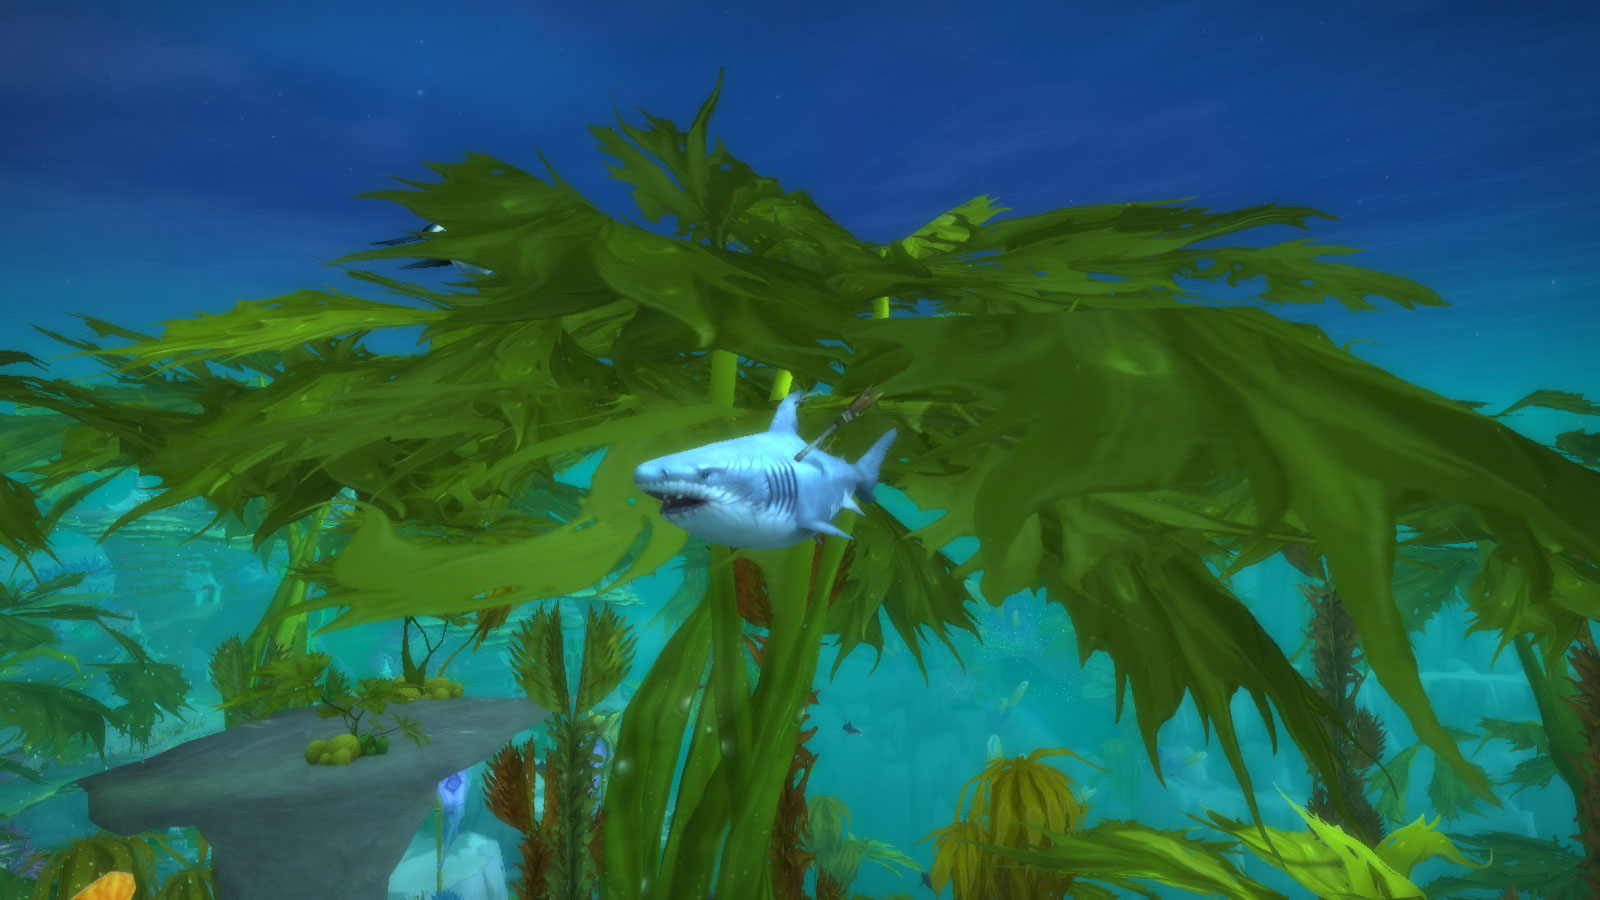 Vieux Haleine-de-poisson